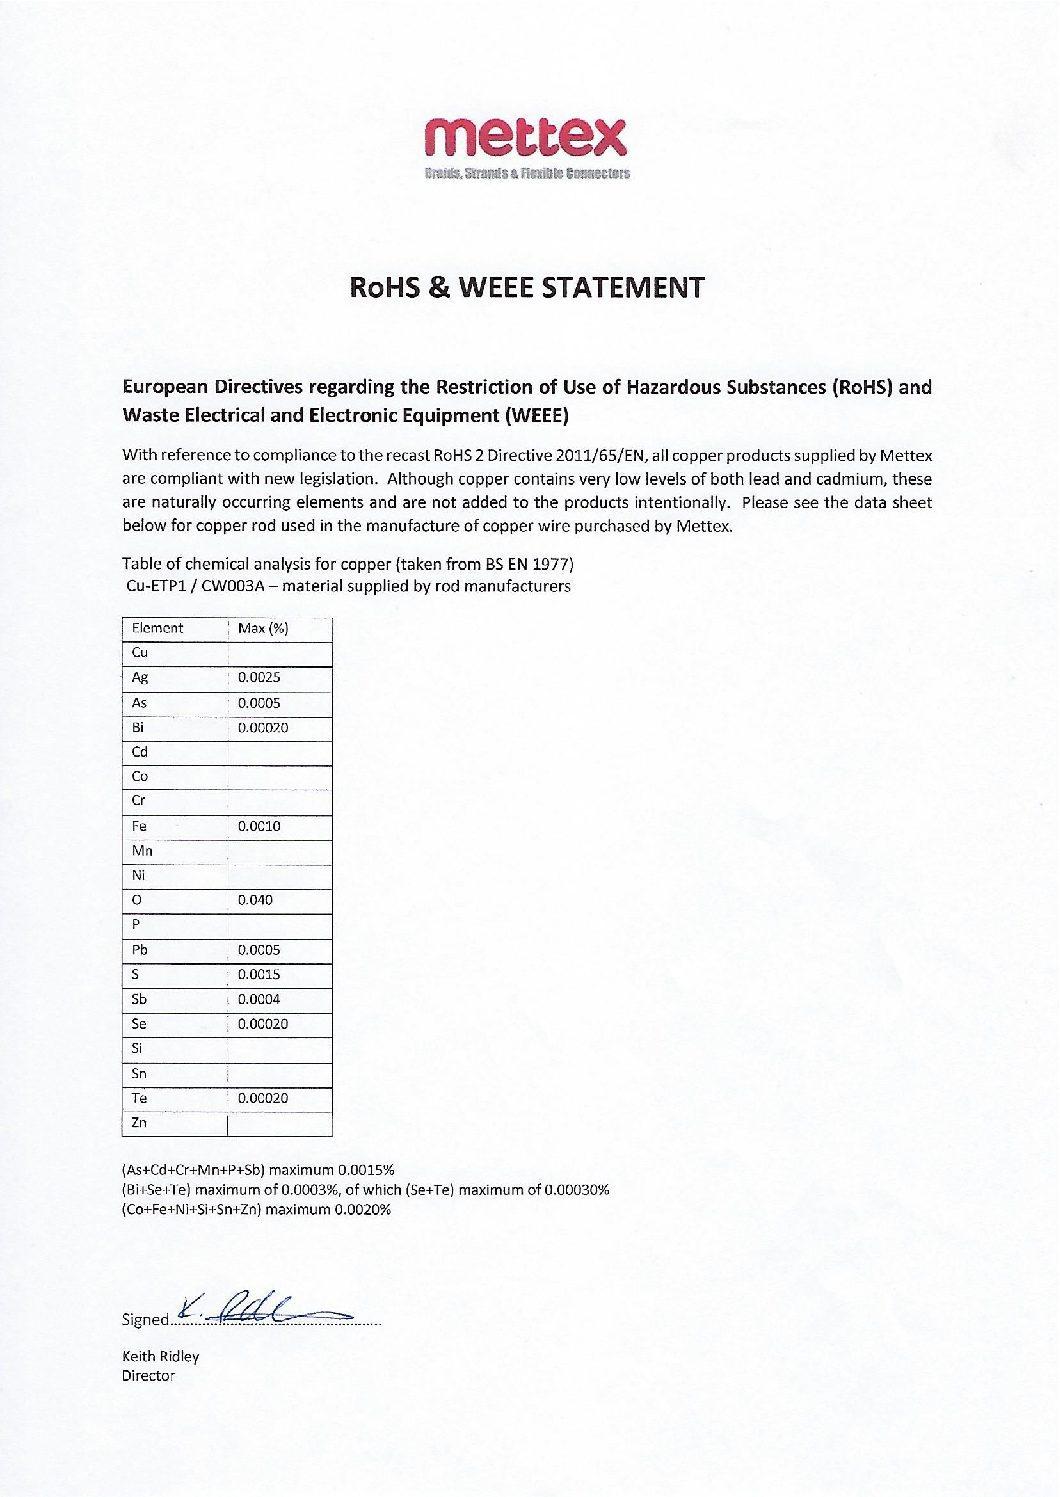 Eu rohs 2 directive pdf